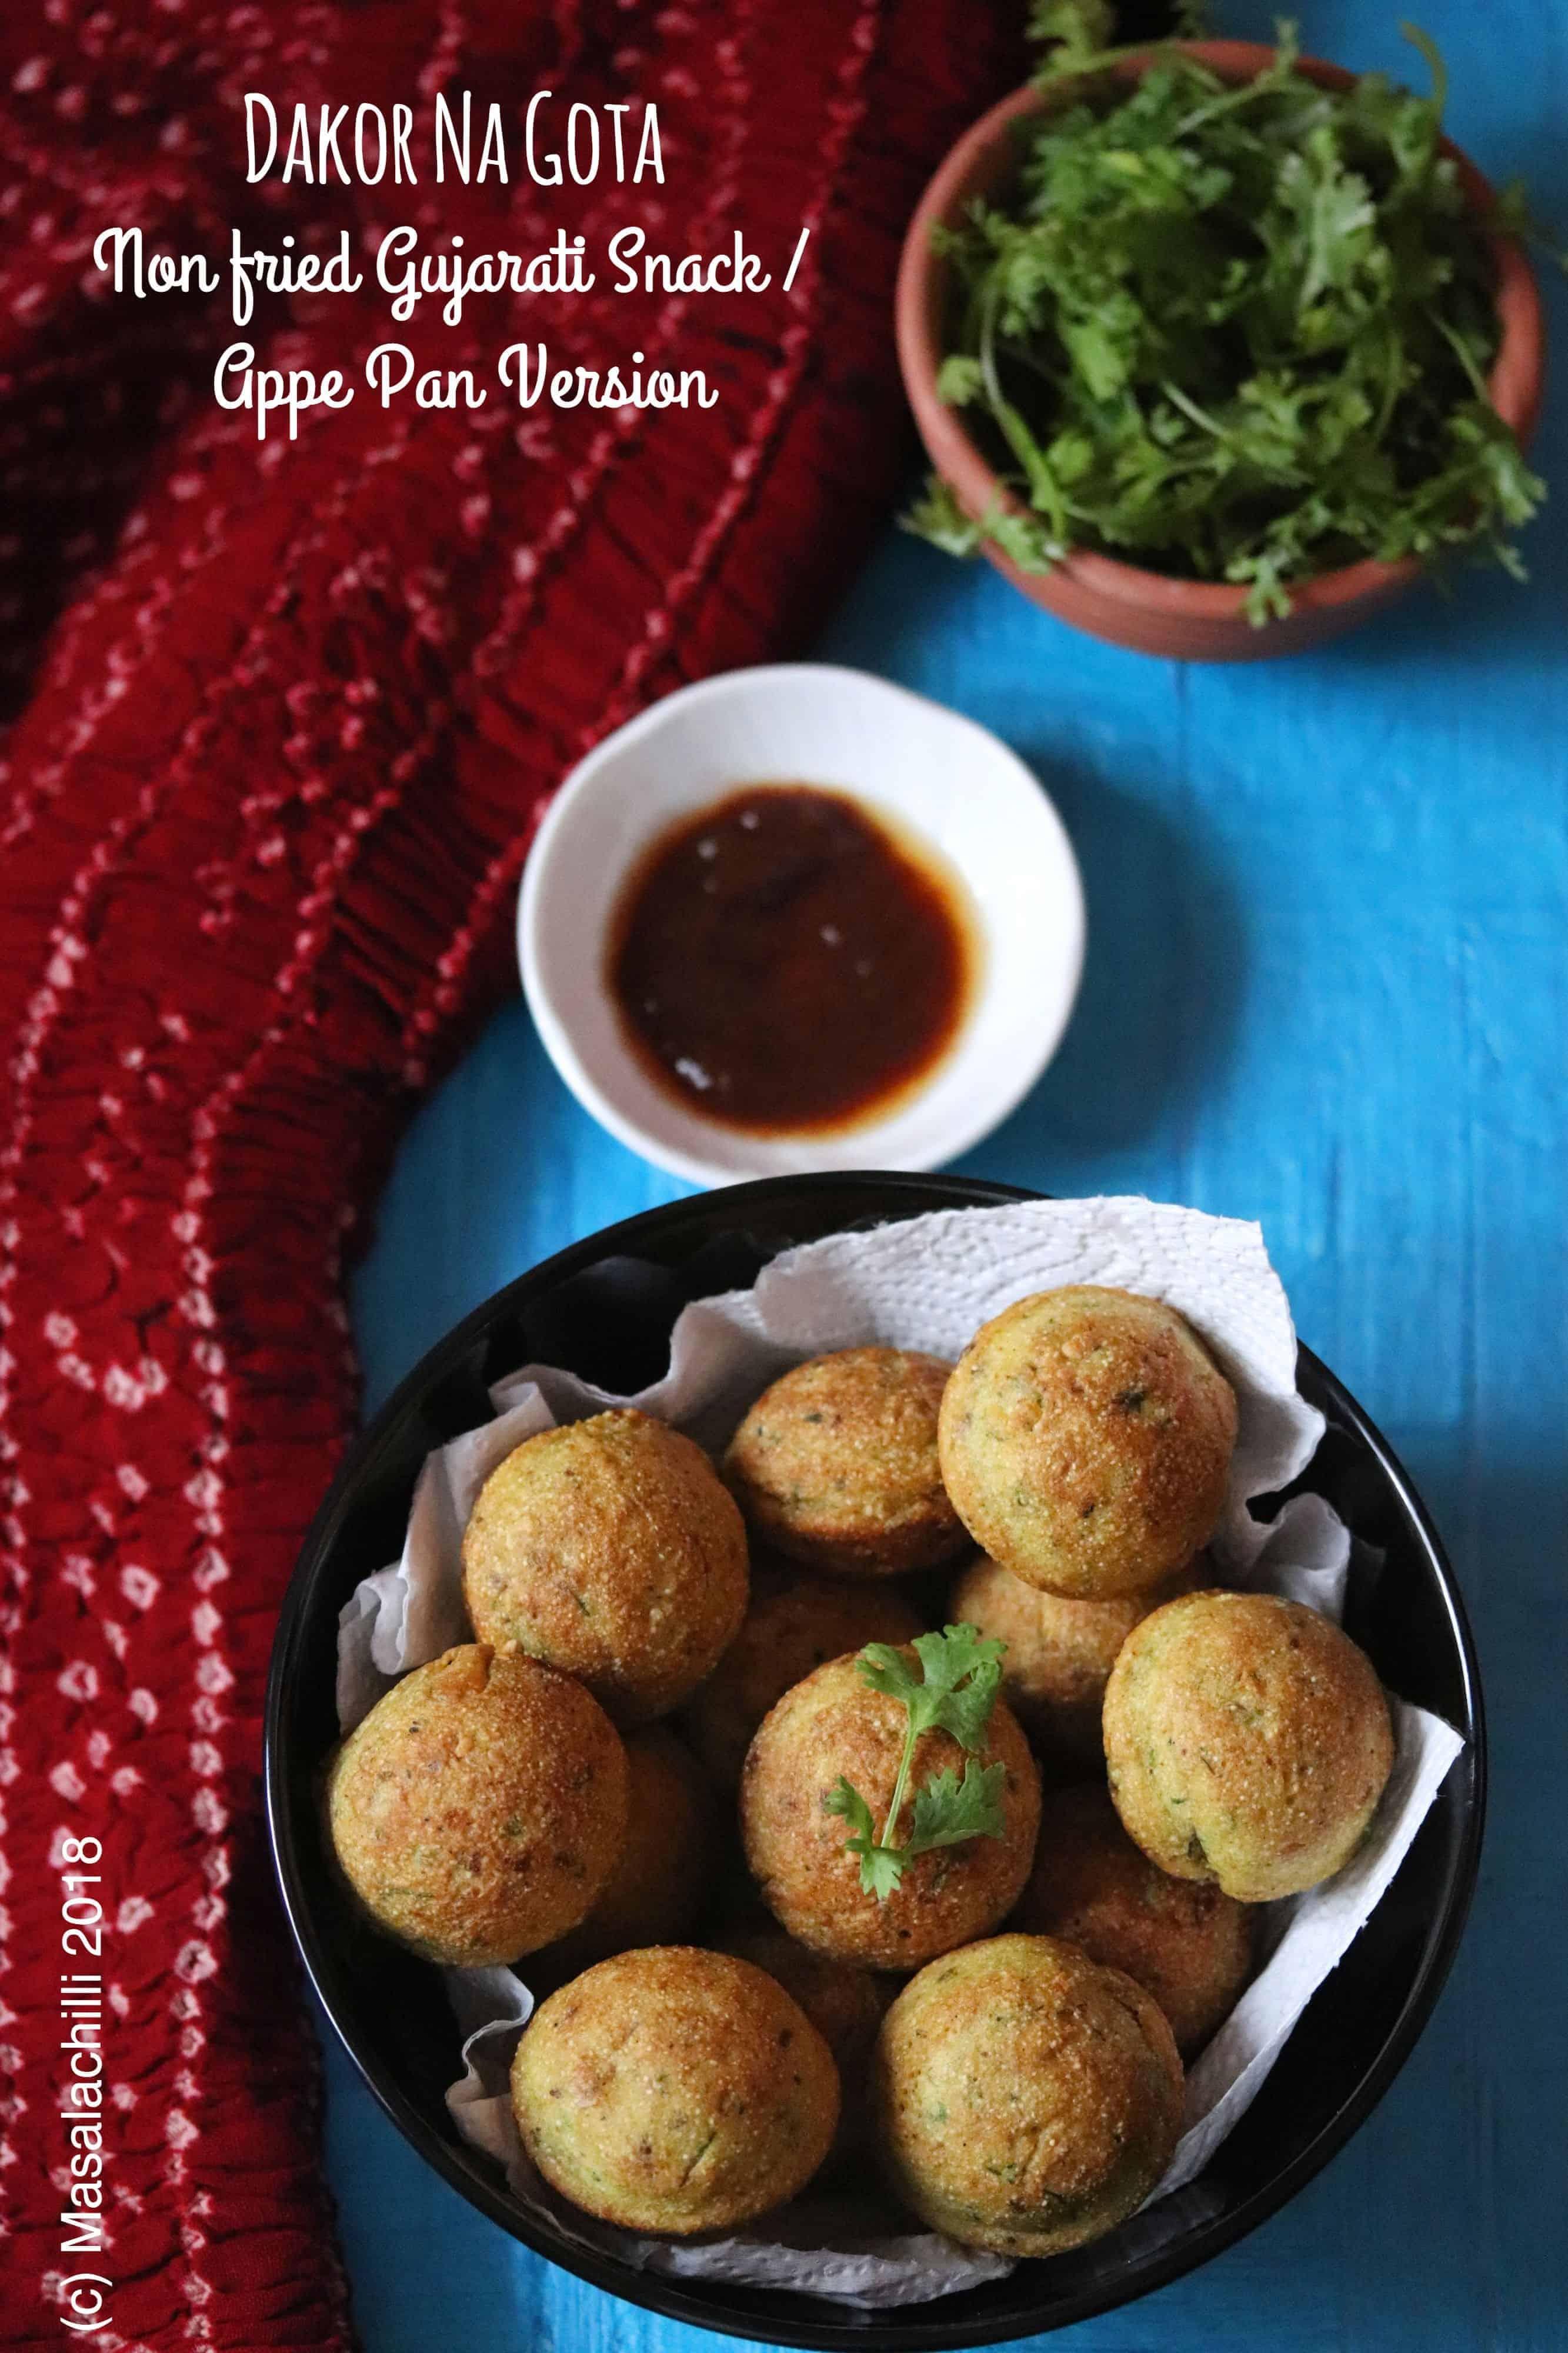 Dakor Na Gota (Non-fried / Appe Pan Version)